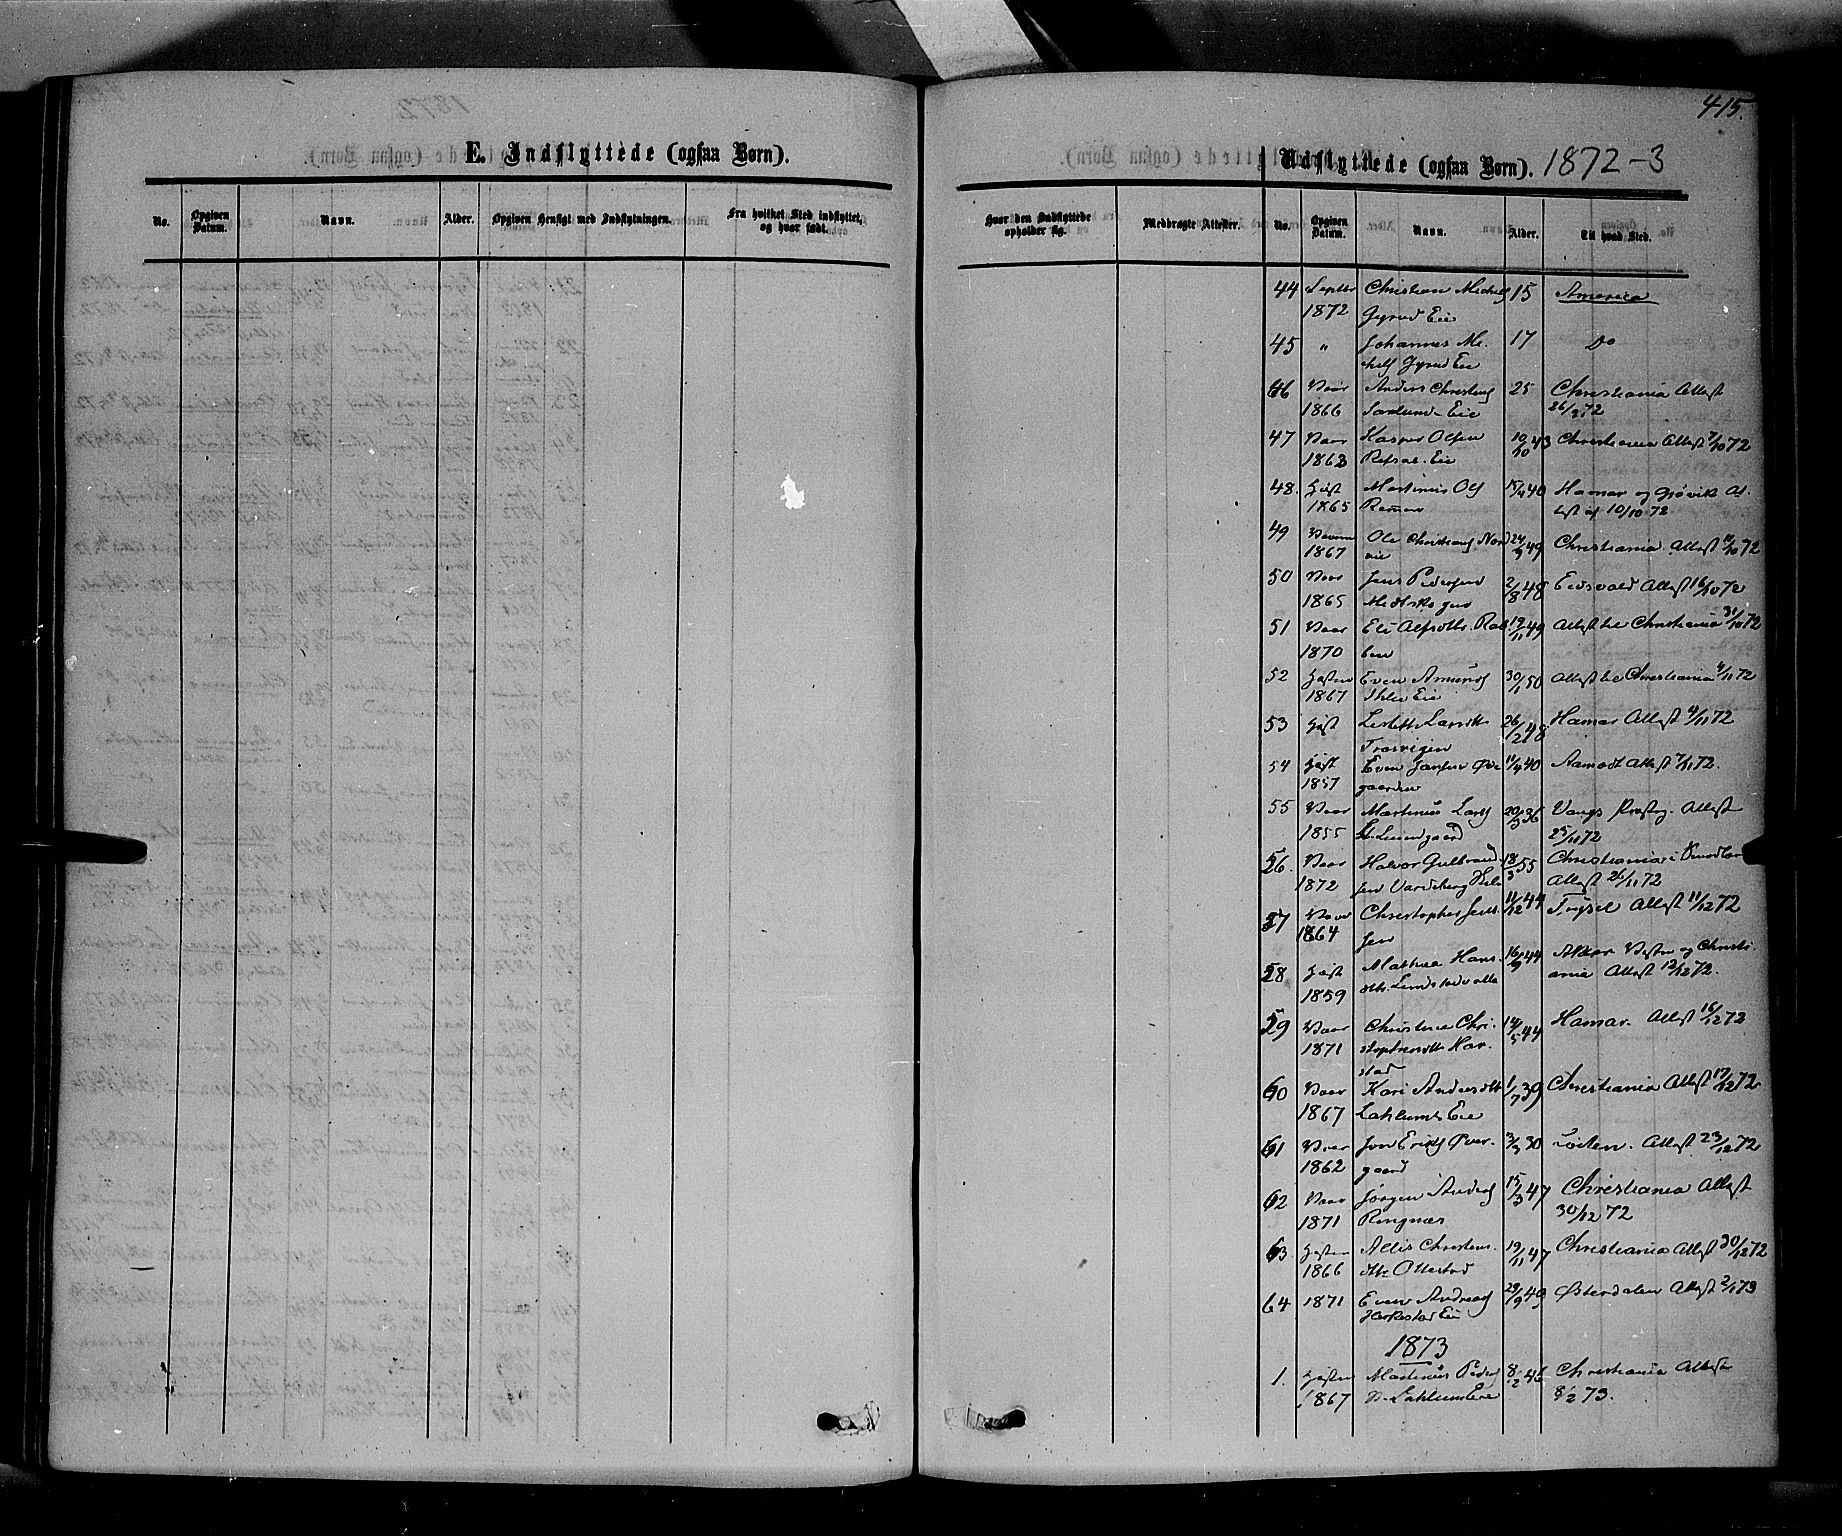 SAH, Stange prestekontor, K/L0013: Ministerialbok nr. 13, 1862-1879, s. 415